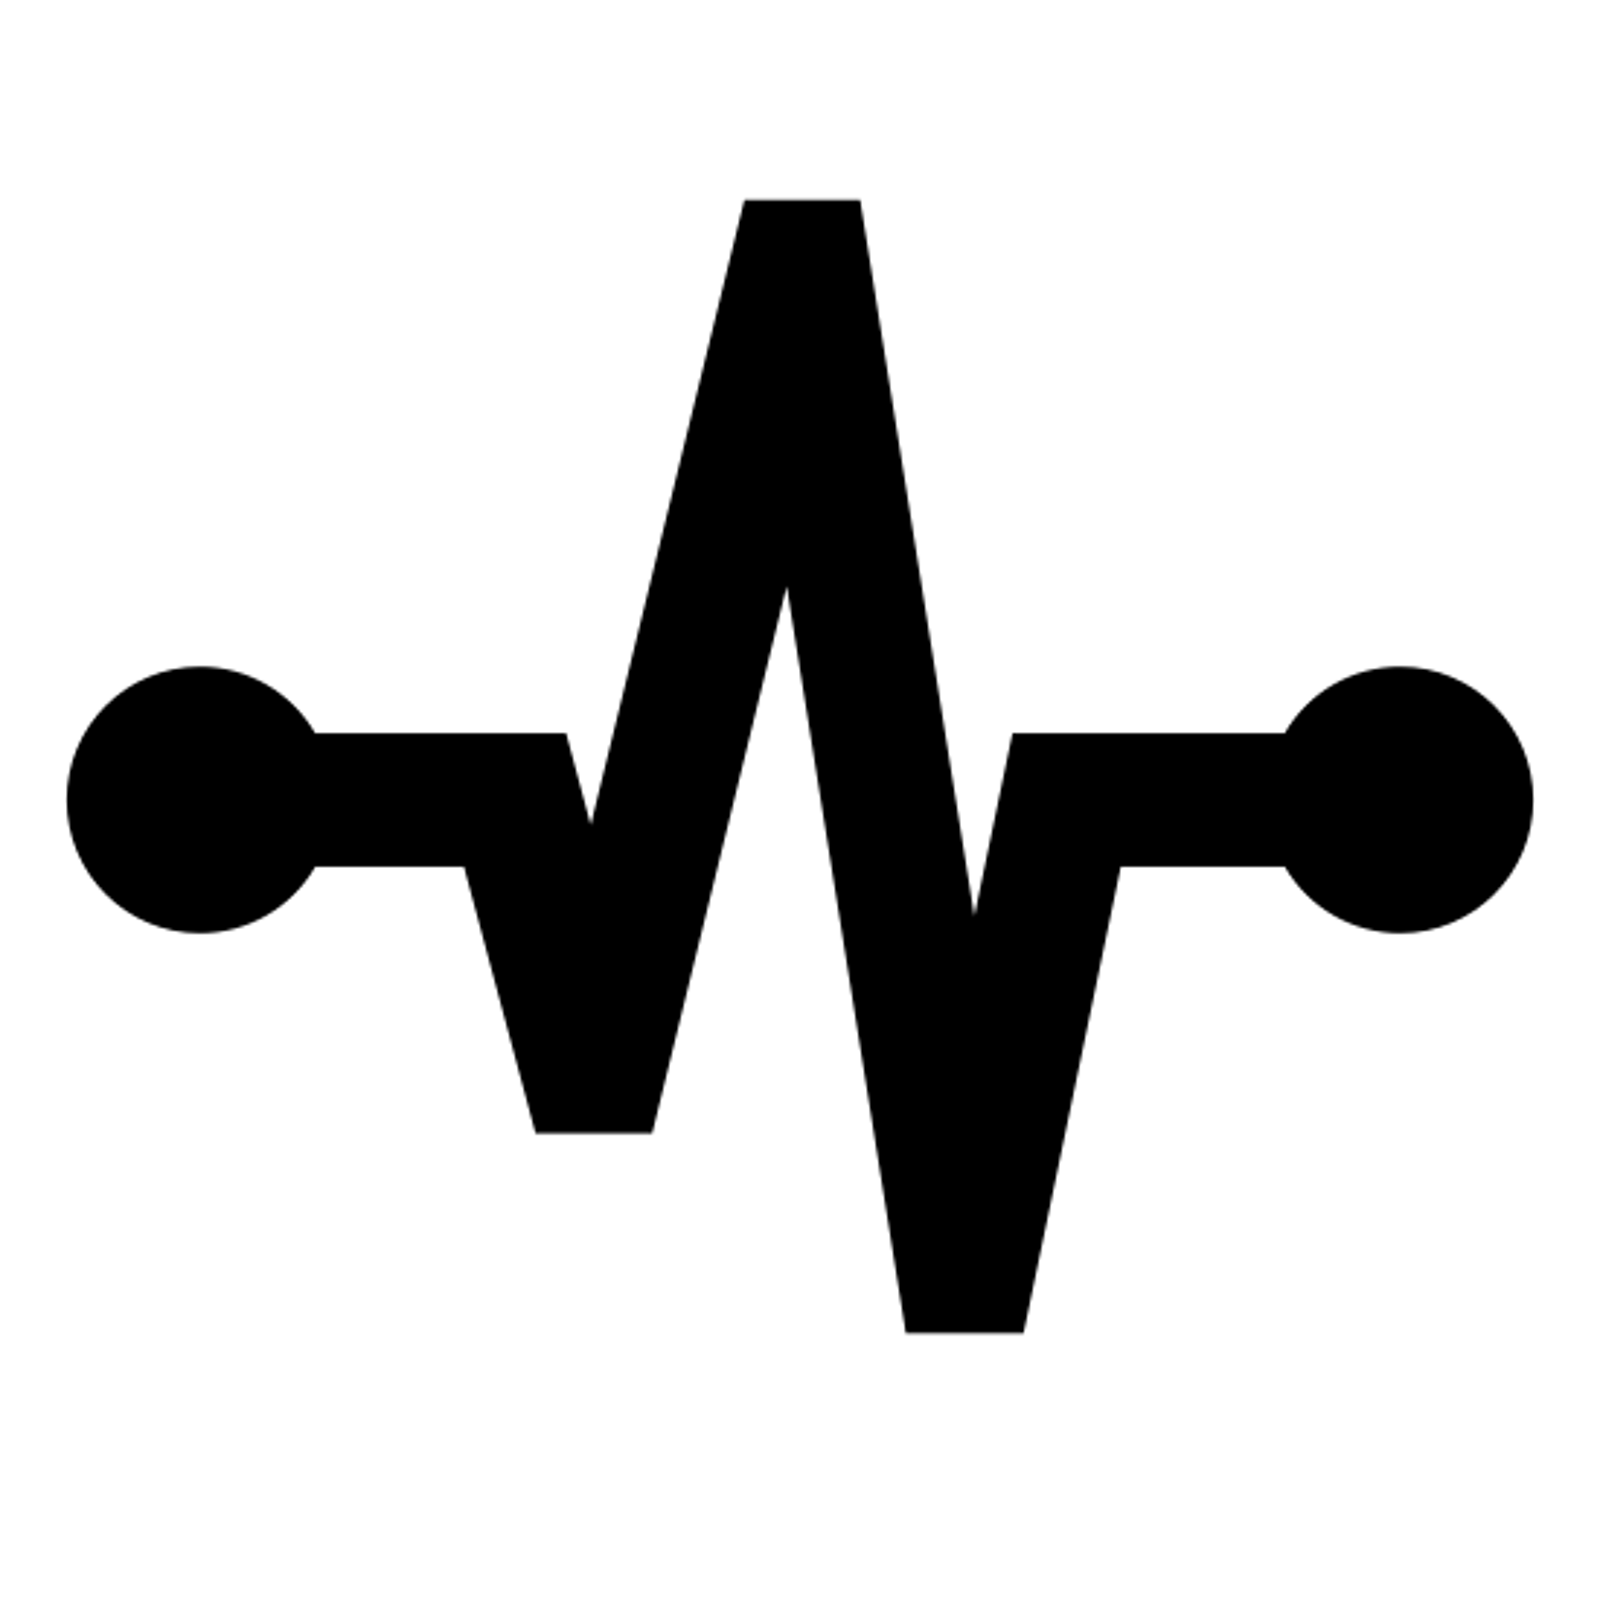 Pulso icon